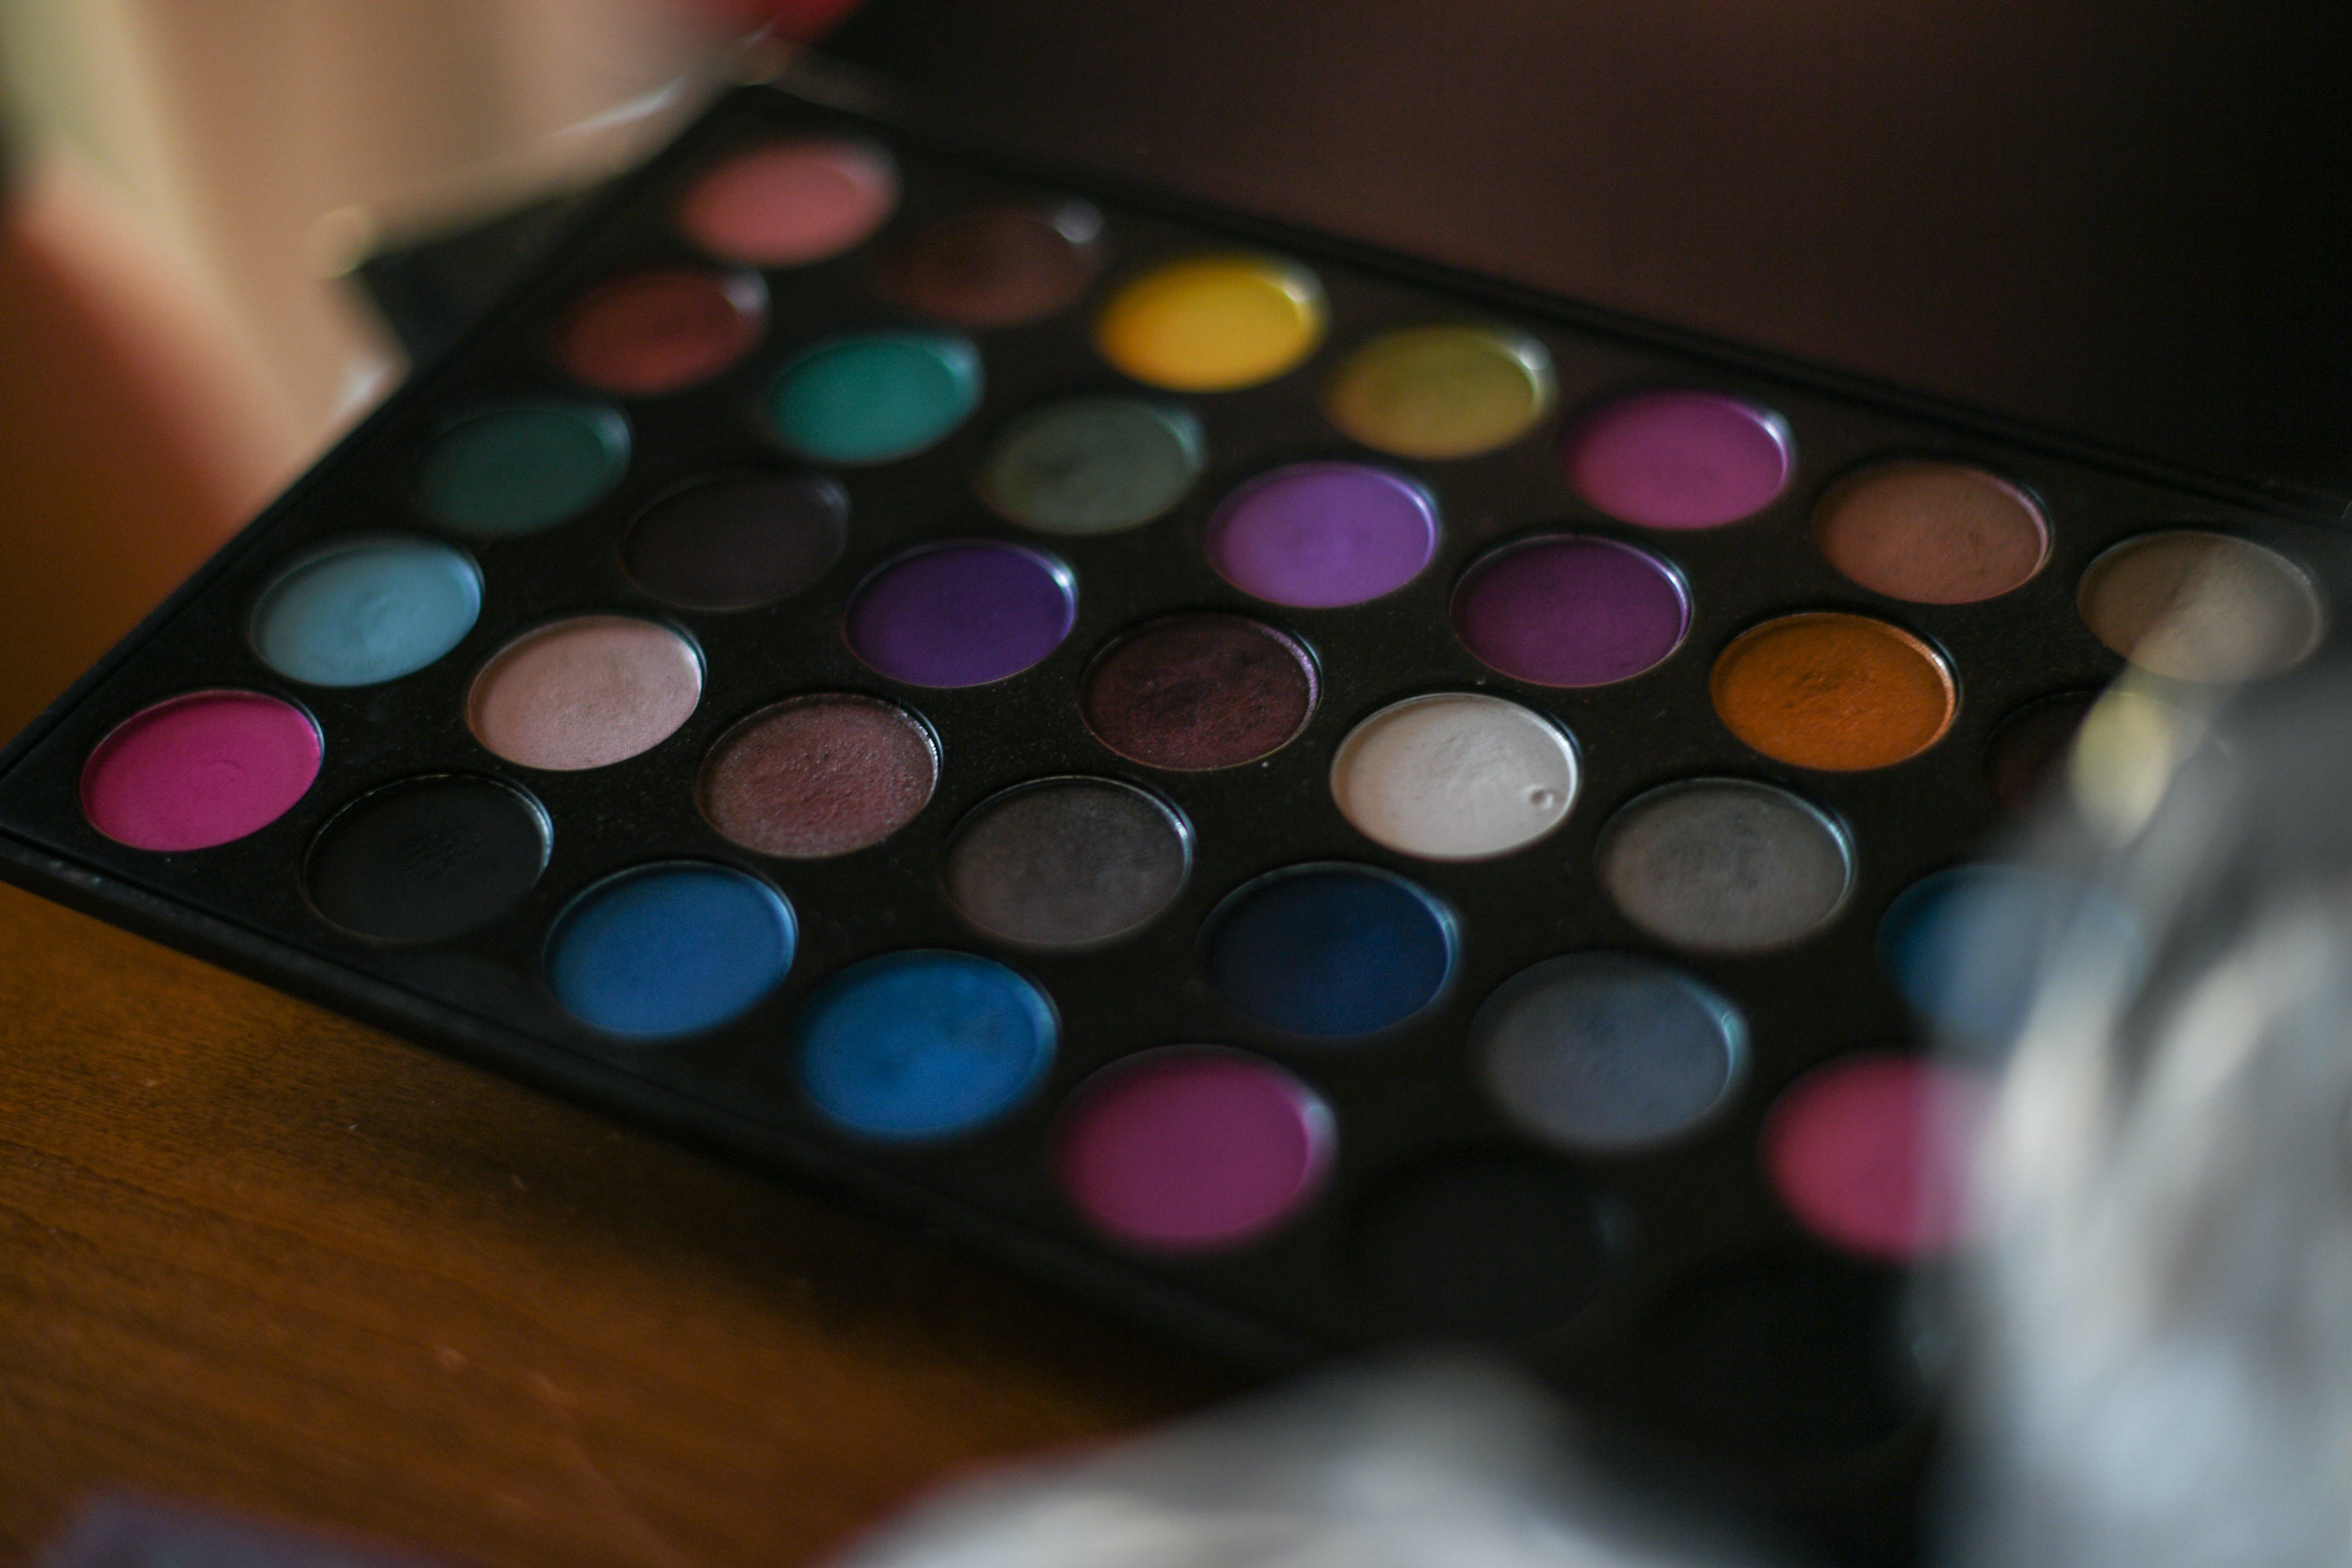 Colorful Make Up Palette